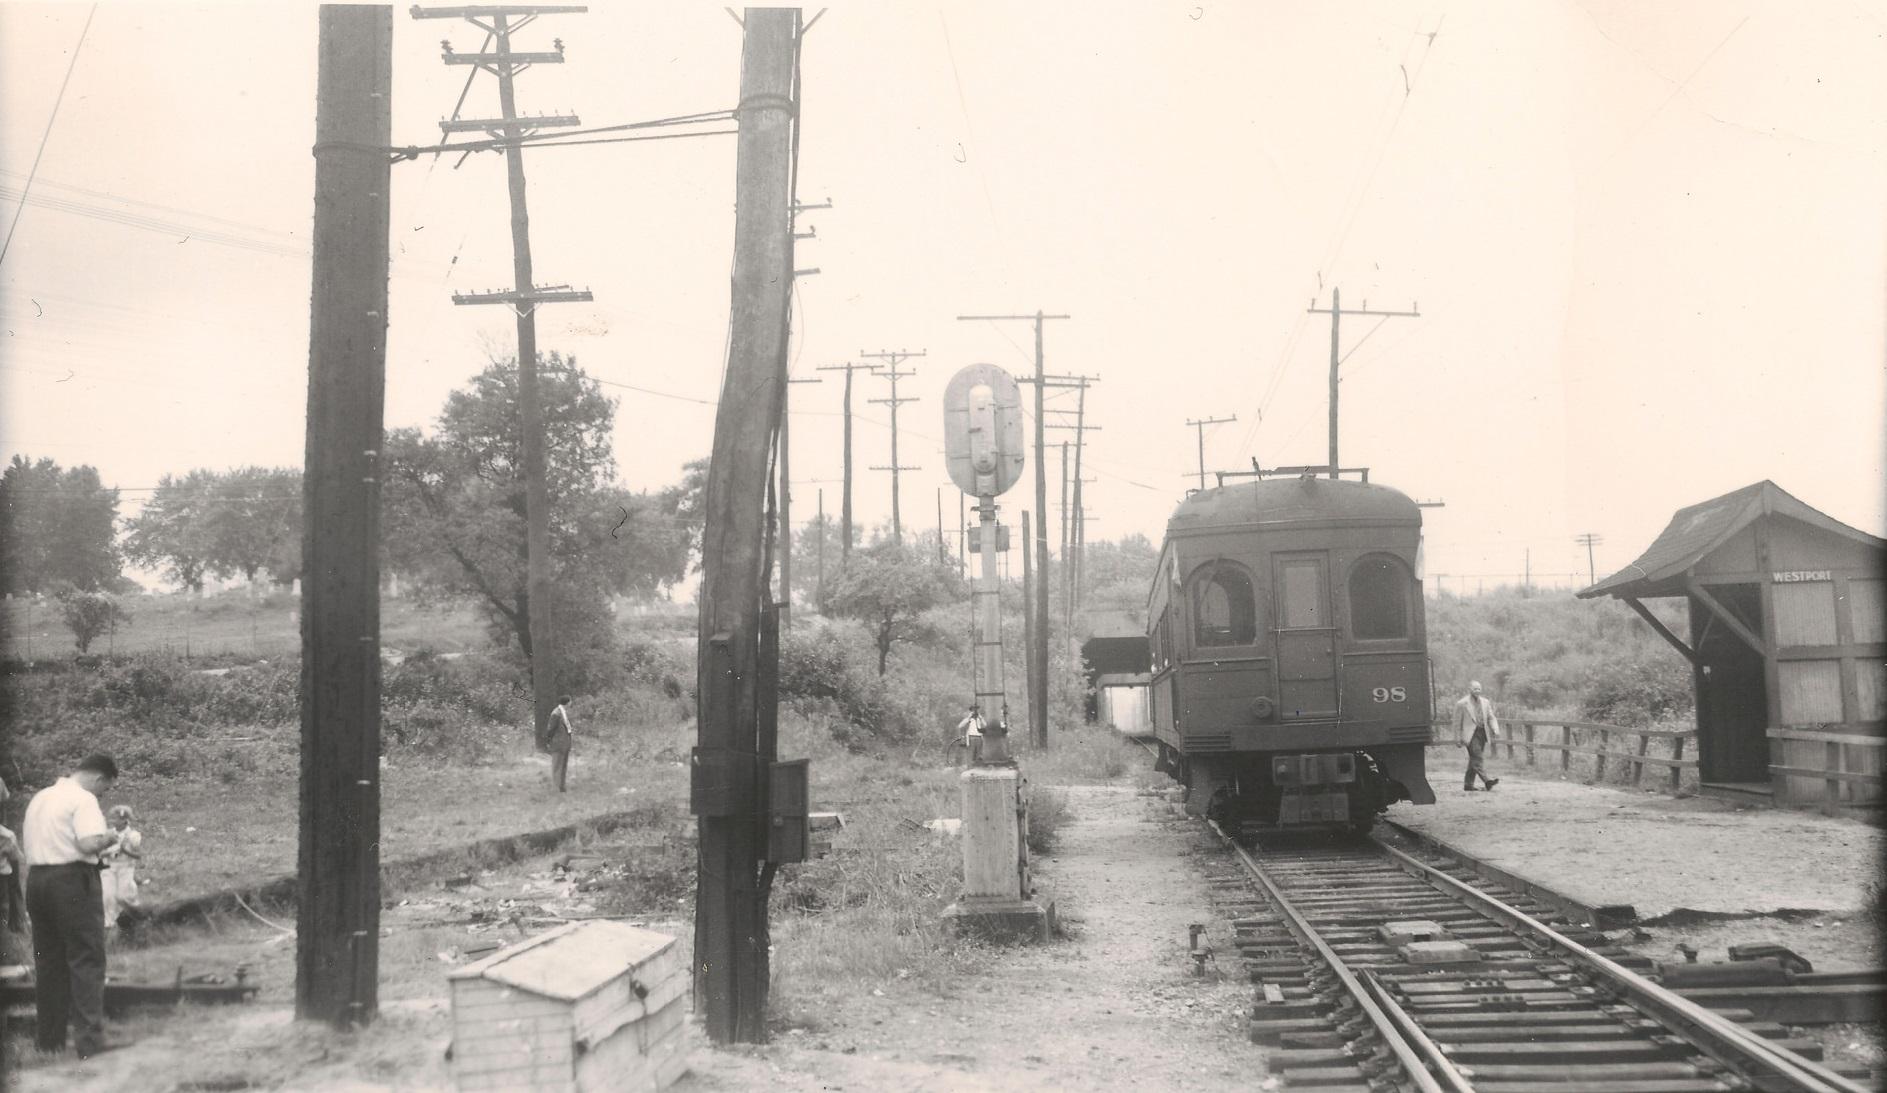 Baltimore & Annapolis Railroad Car #98 at Westport Station. Westport Station, Maryland Date: June 19, 1949. Source: Kevin Mueller Collection.